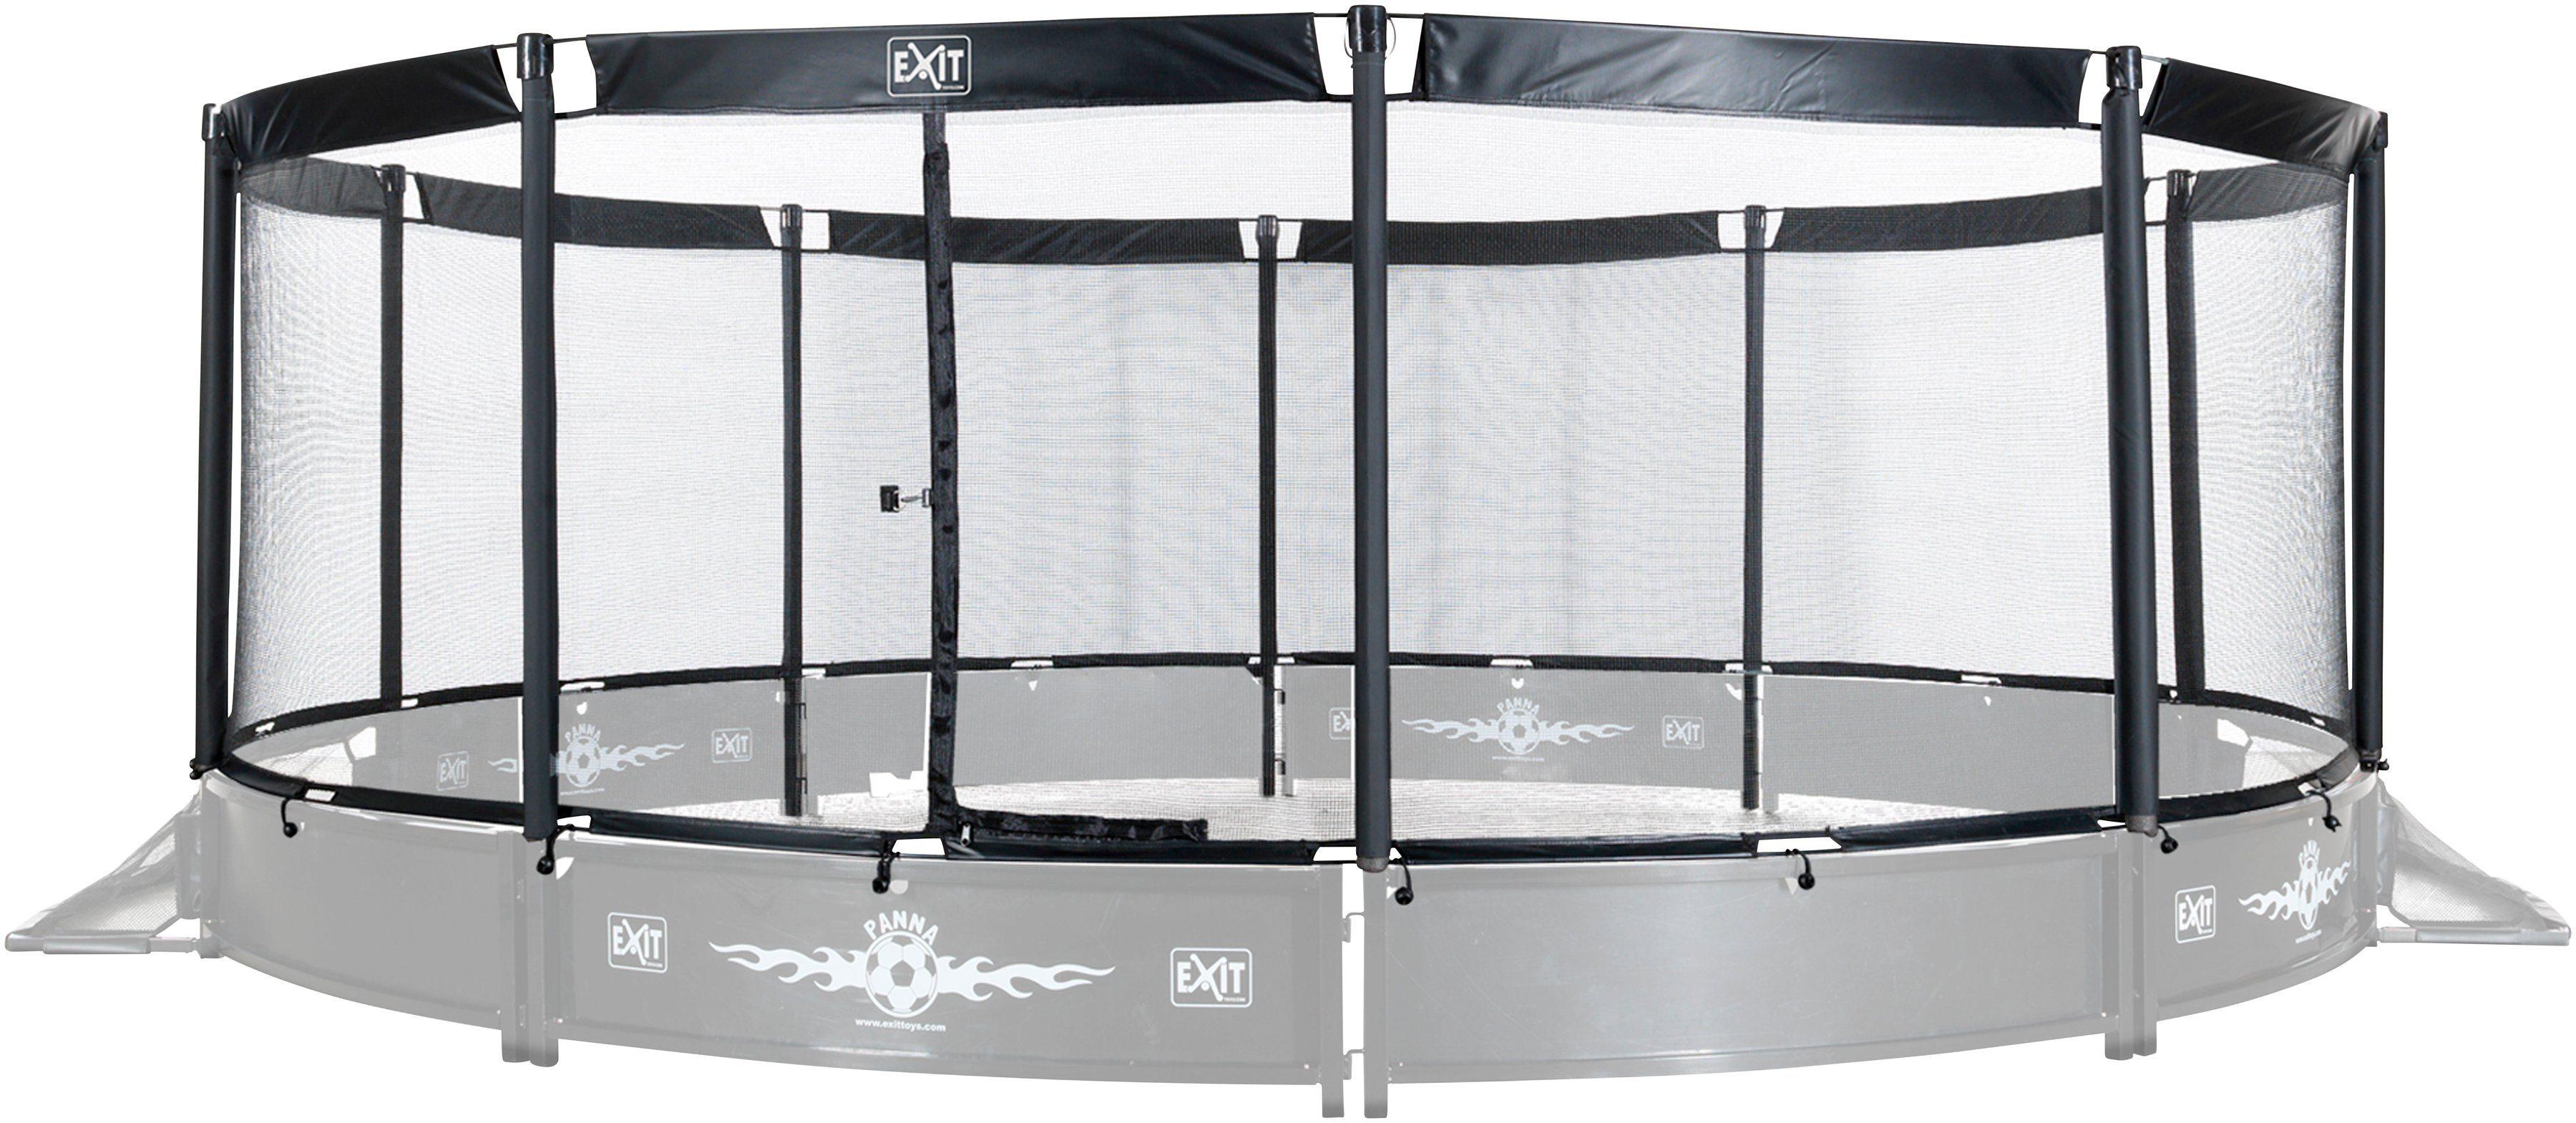 EXIT Rebounder »Panna Surround Net«, BxH: 488x138 cm